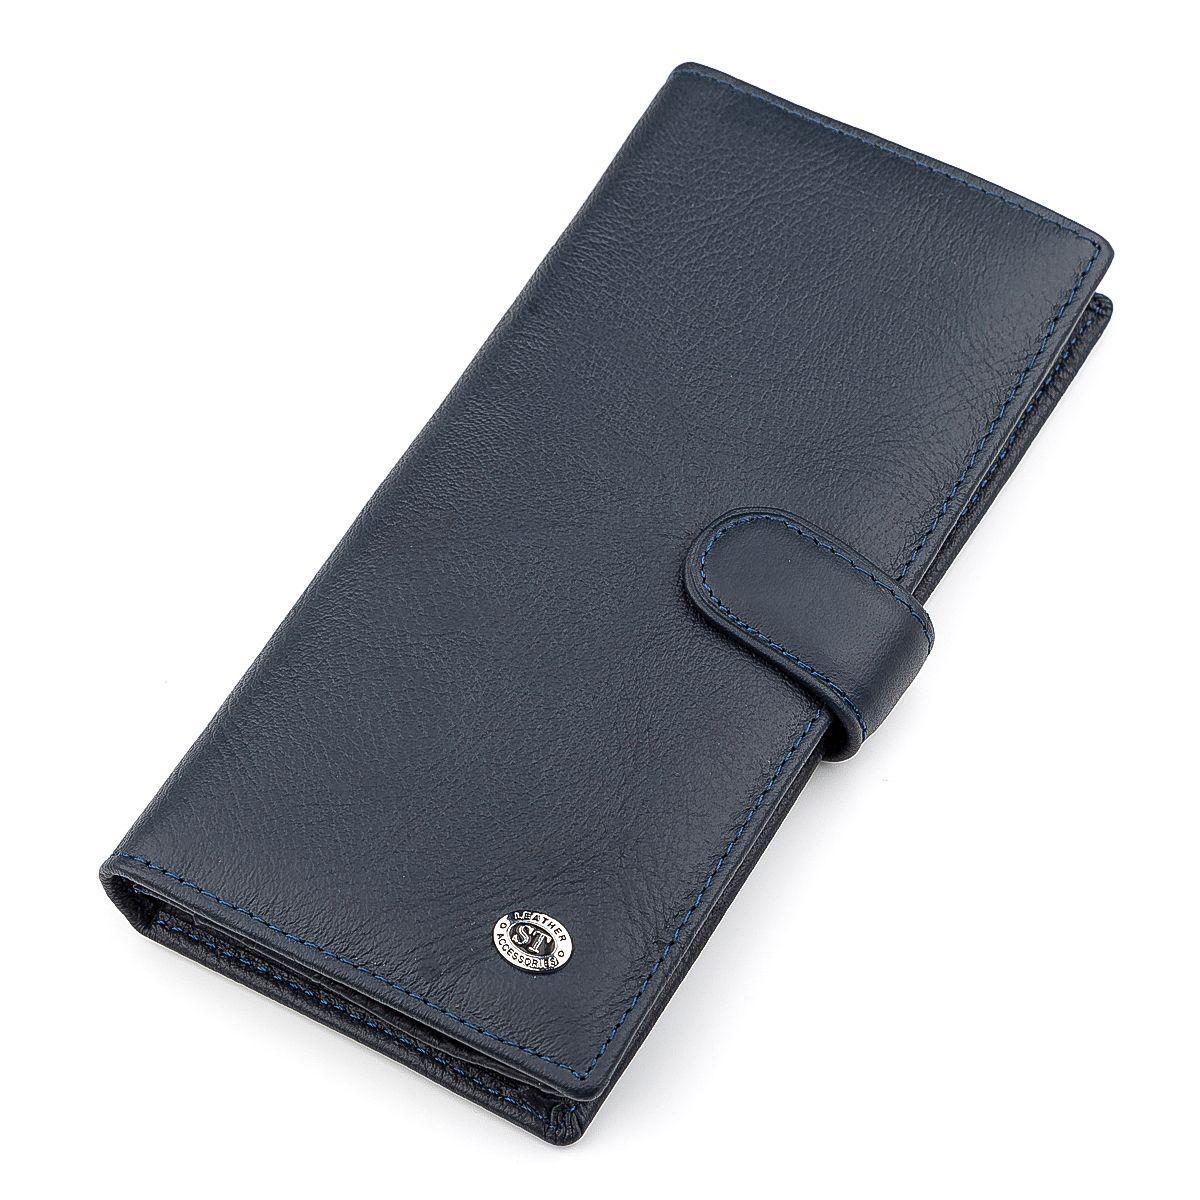 Мужской Купюрник St Leather 18365 (St147) Кожаный Синий, Синий